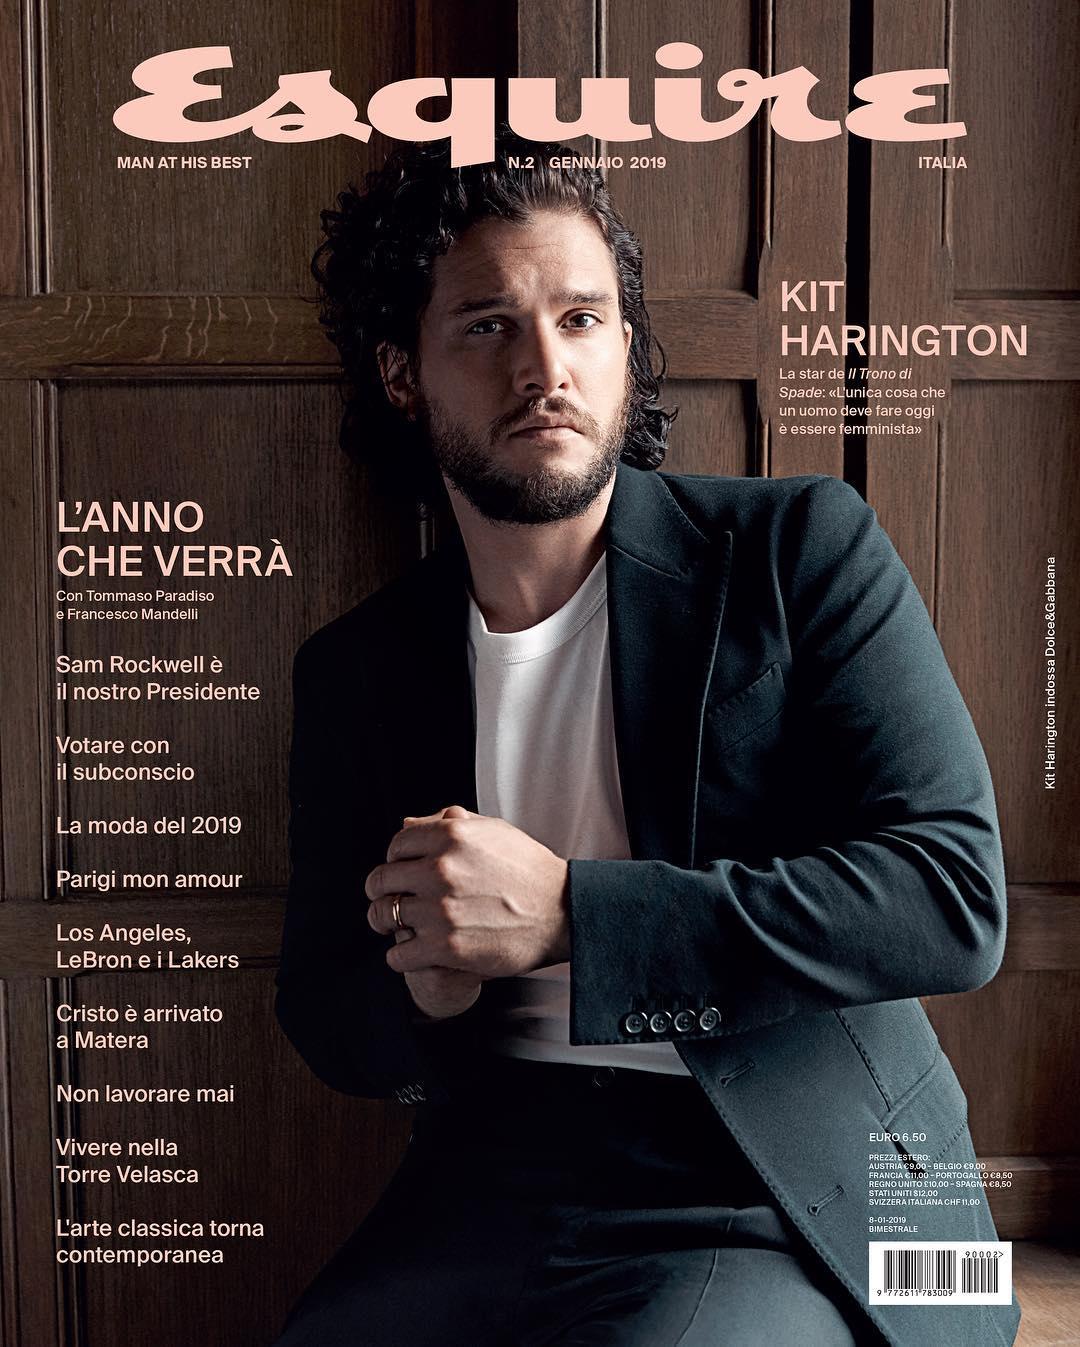 Kit Harington y Sam Rockell para Esquire Italia Febrero 2019